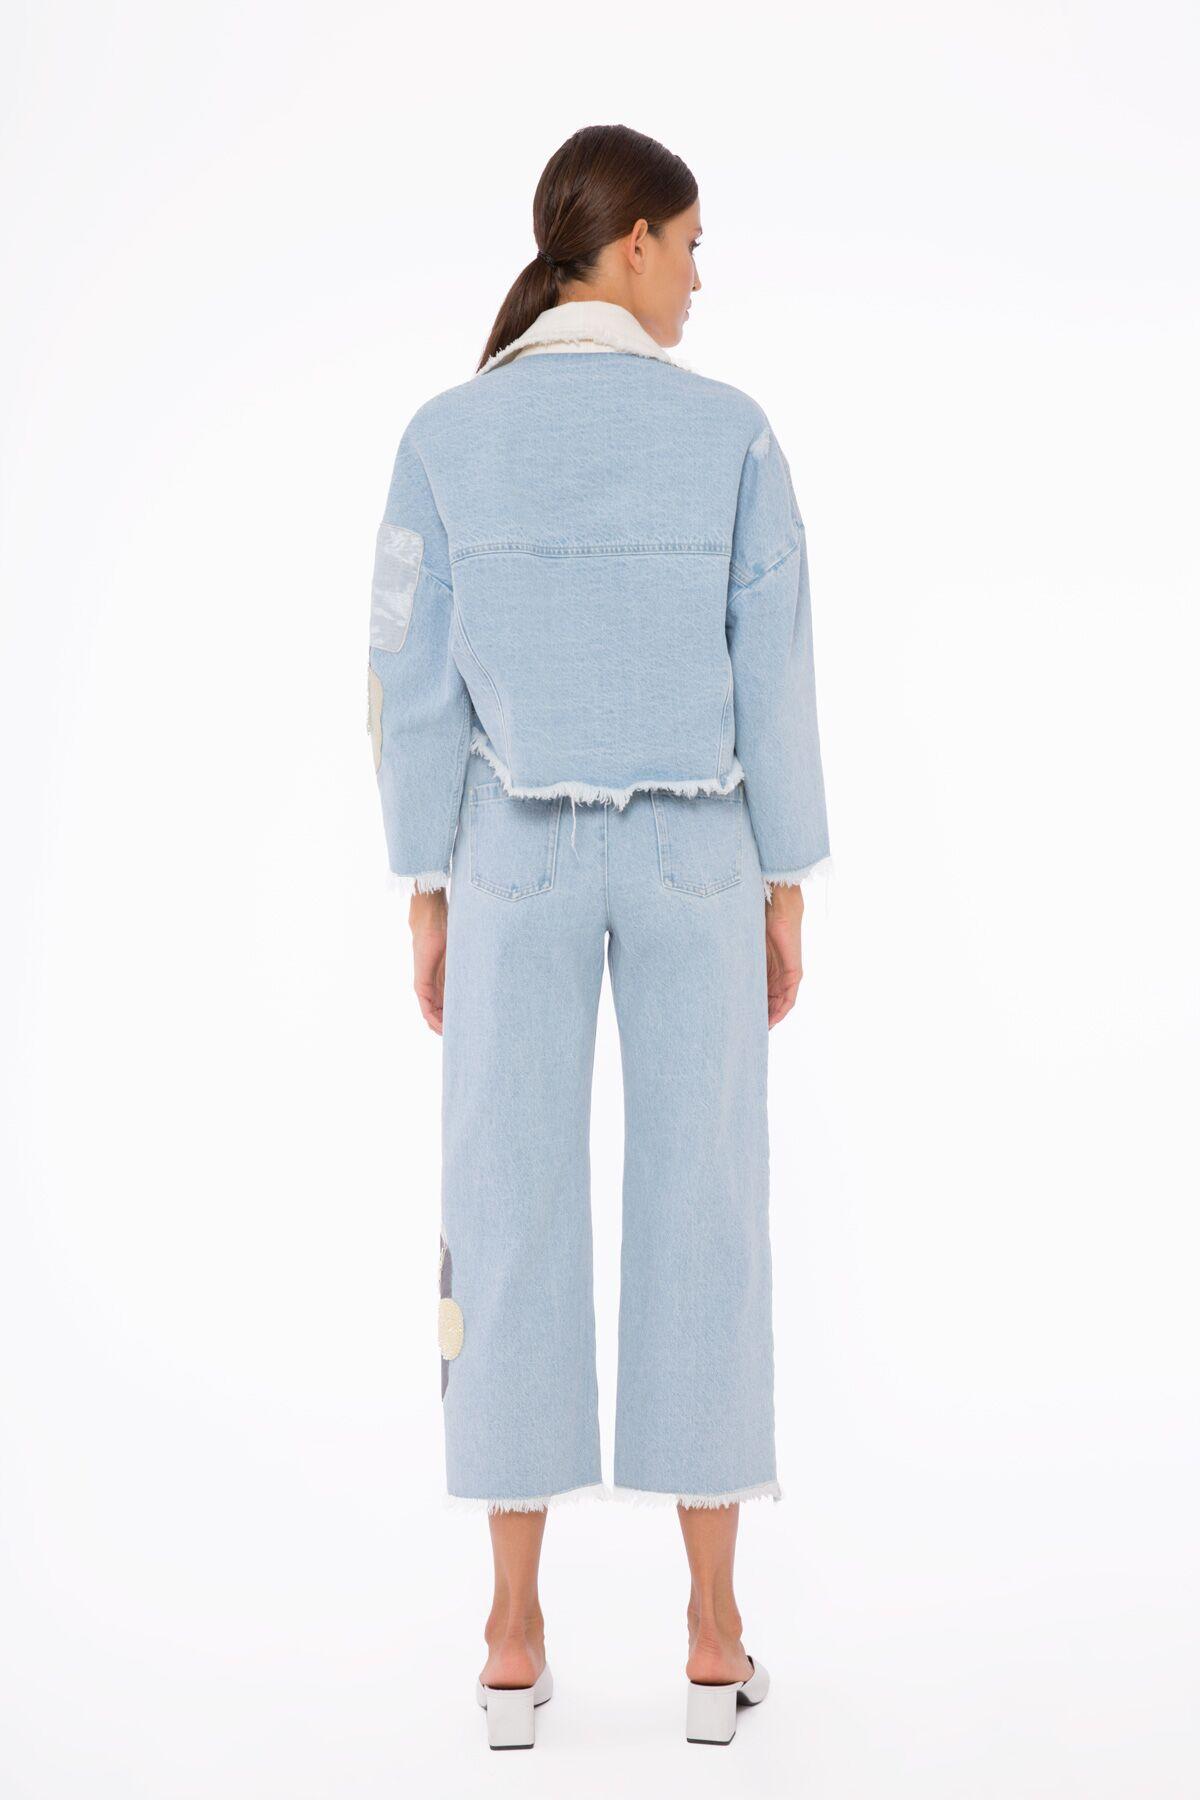 Paçada Nakış Detaylı, Bilek Boy Mavi Jean Pantolon